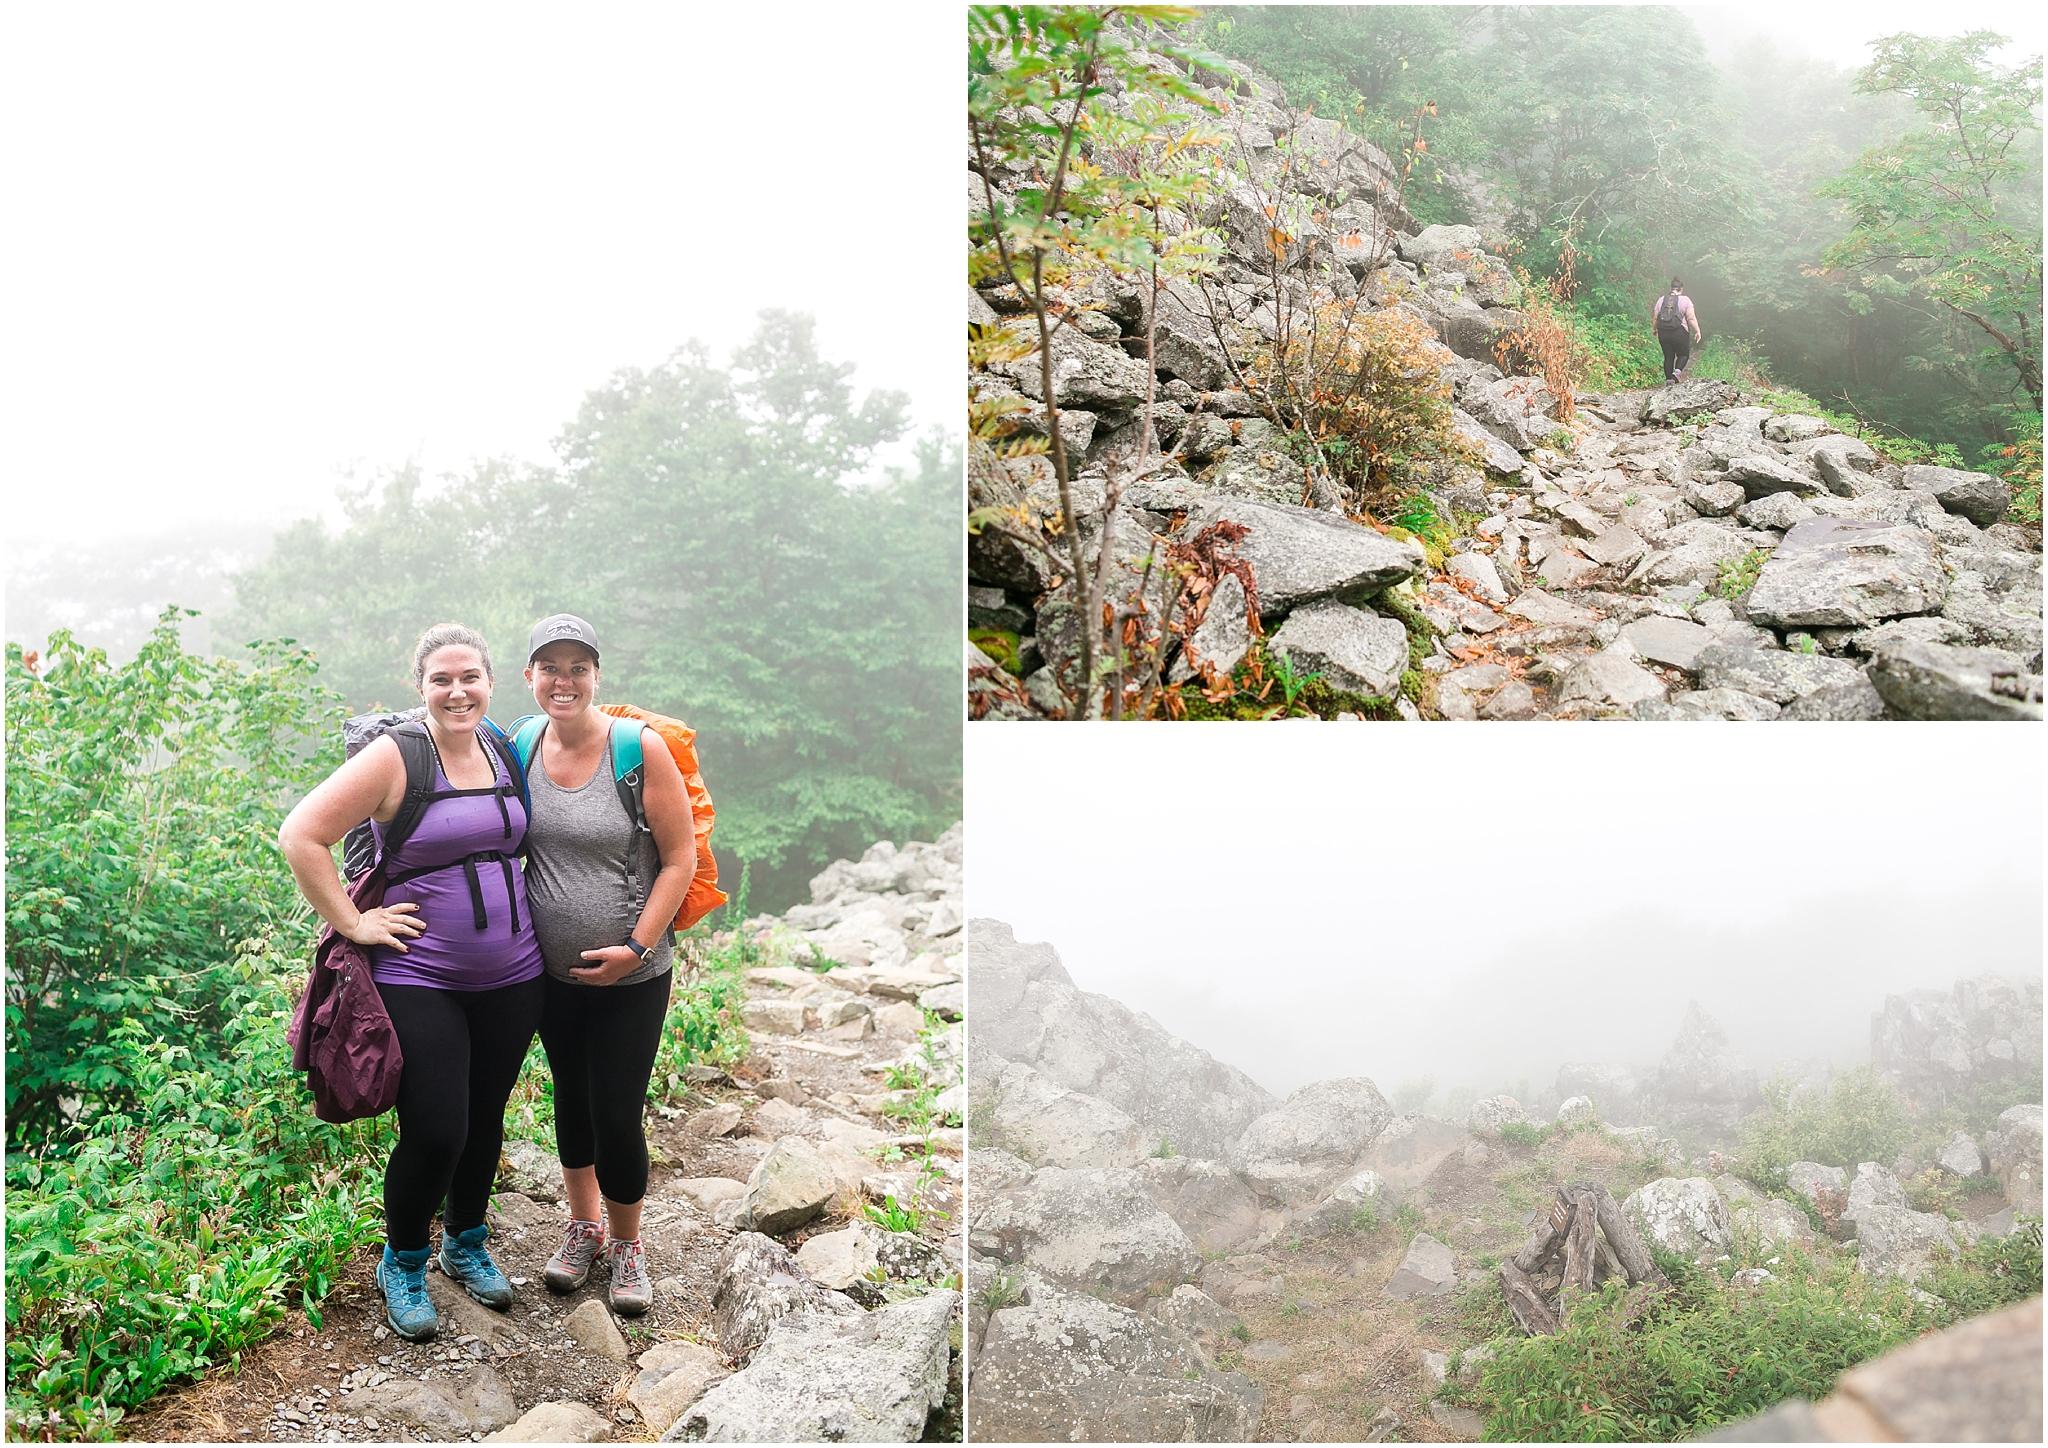 her hike collective, hawksbill mountain trail, hawksbill summit, Appalachian trail